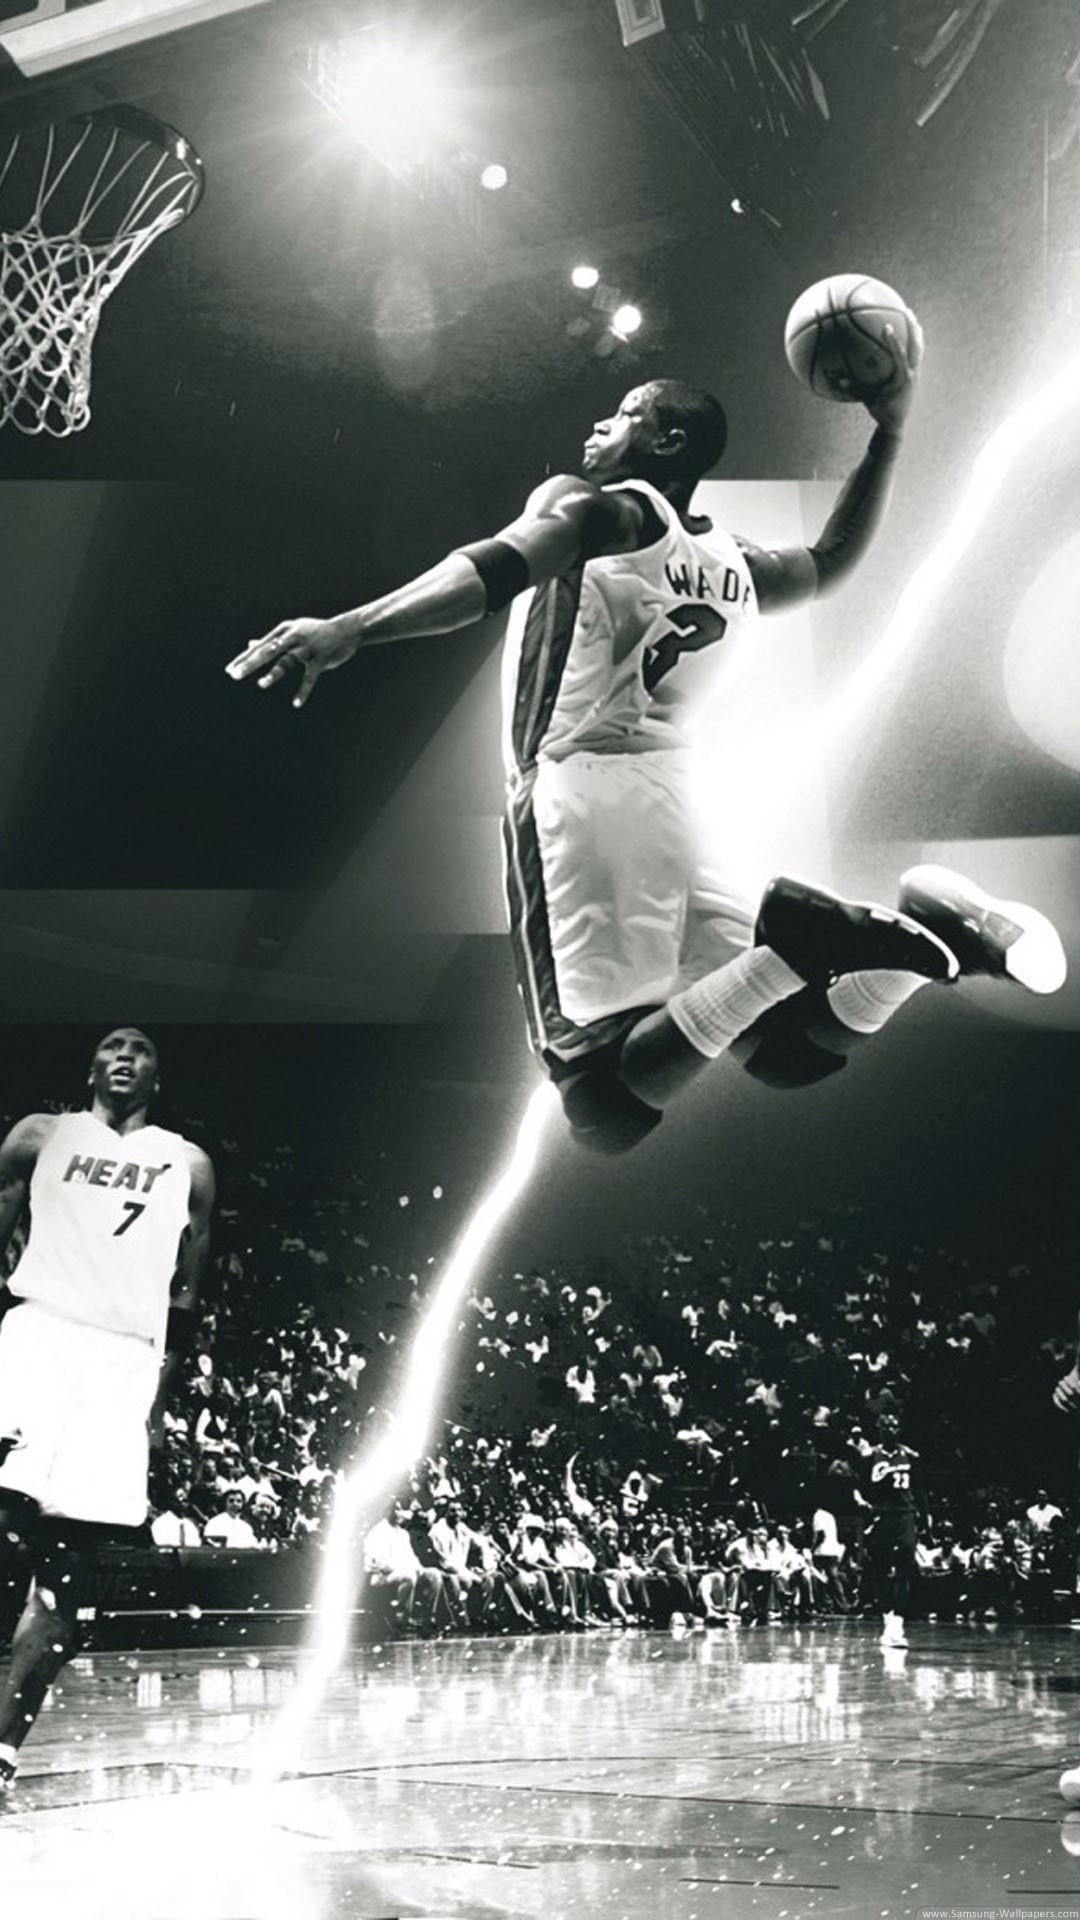 Wallpaper NBA images) 2018 (63+ Basketball